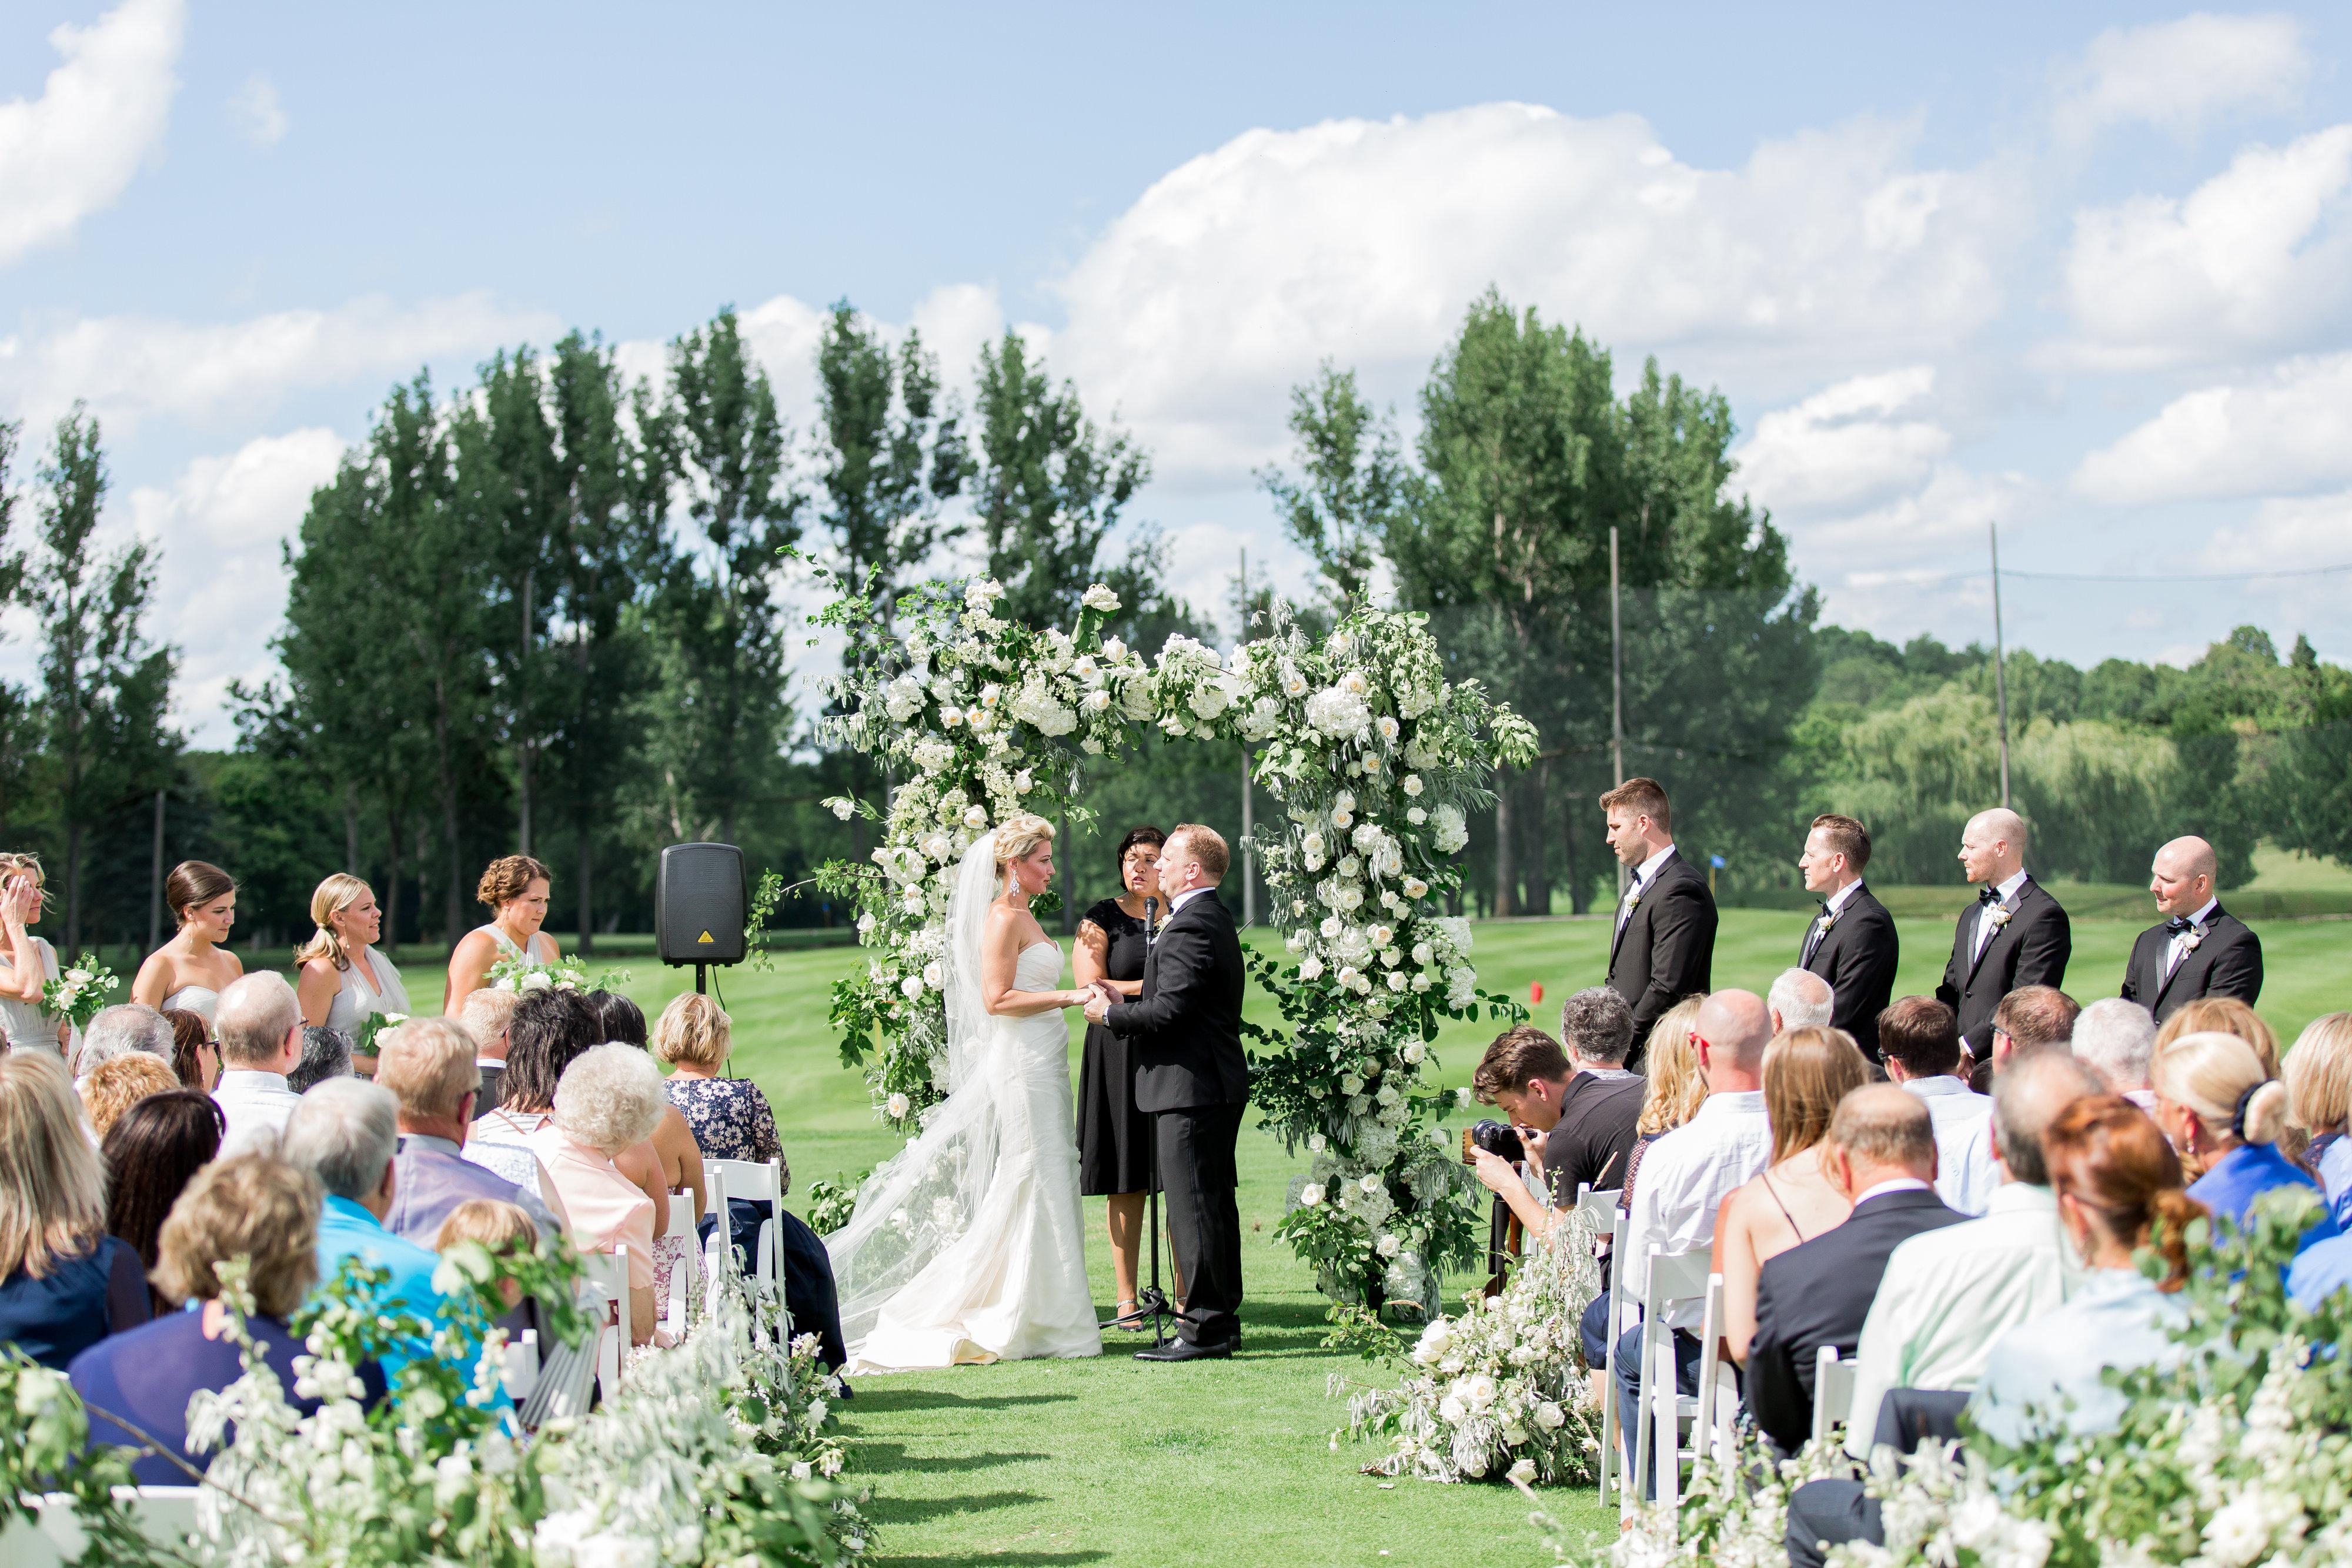 Minnesota Outdoor Wedding